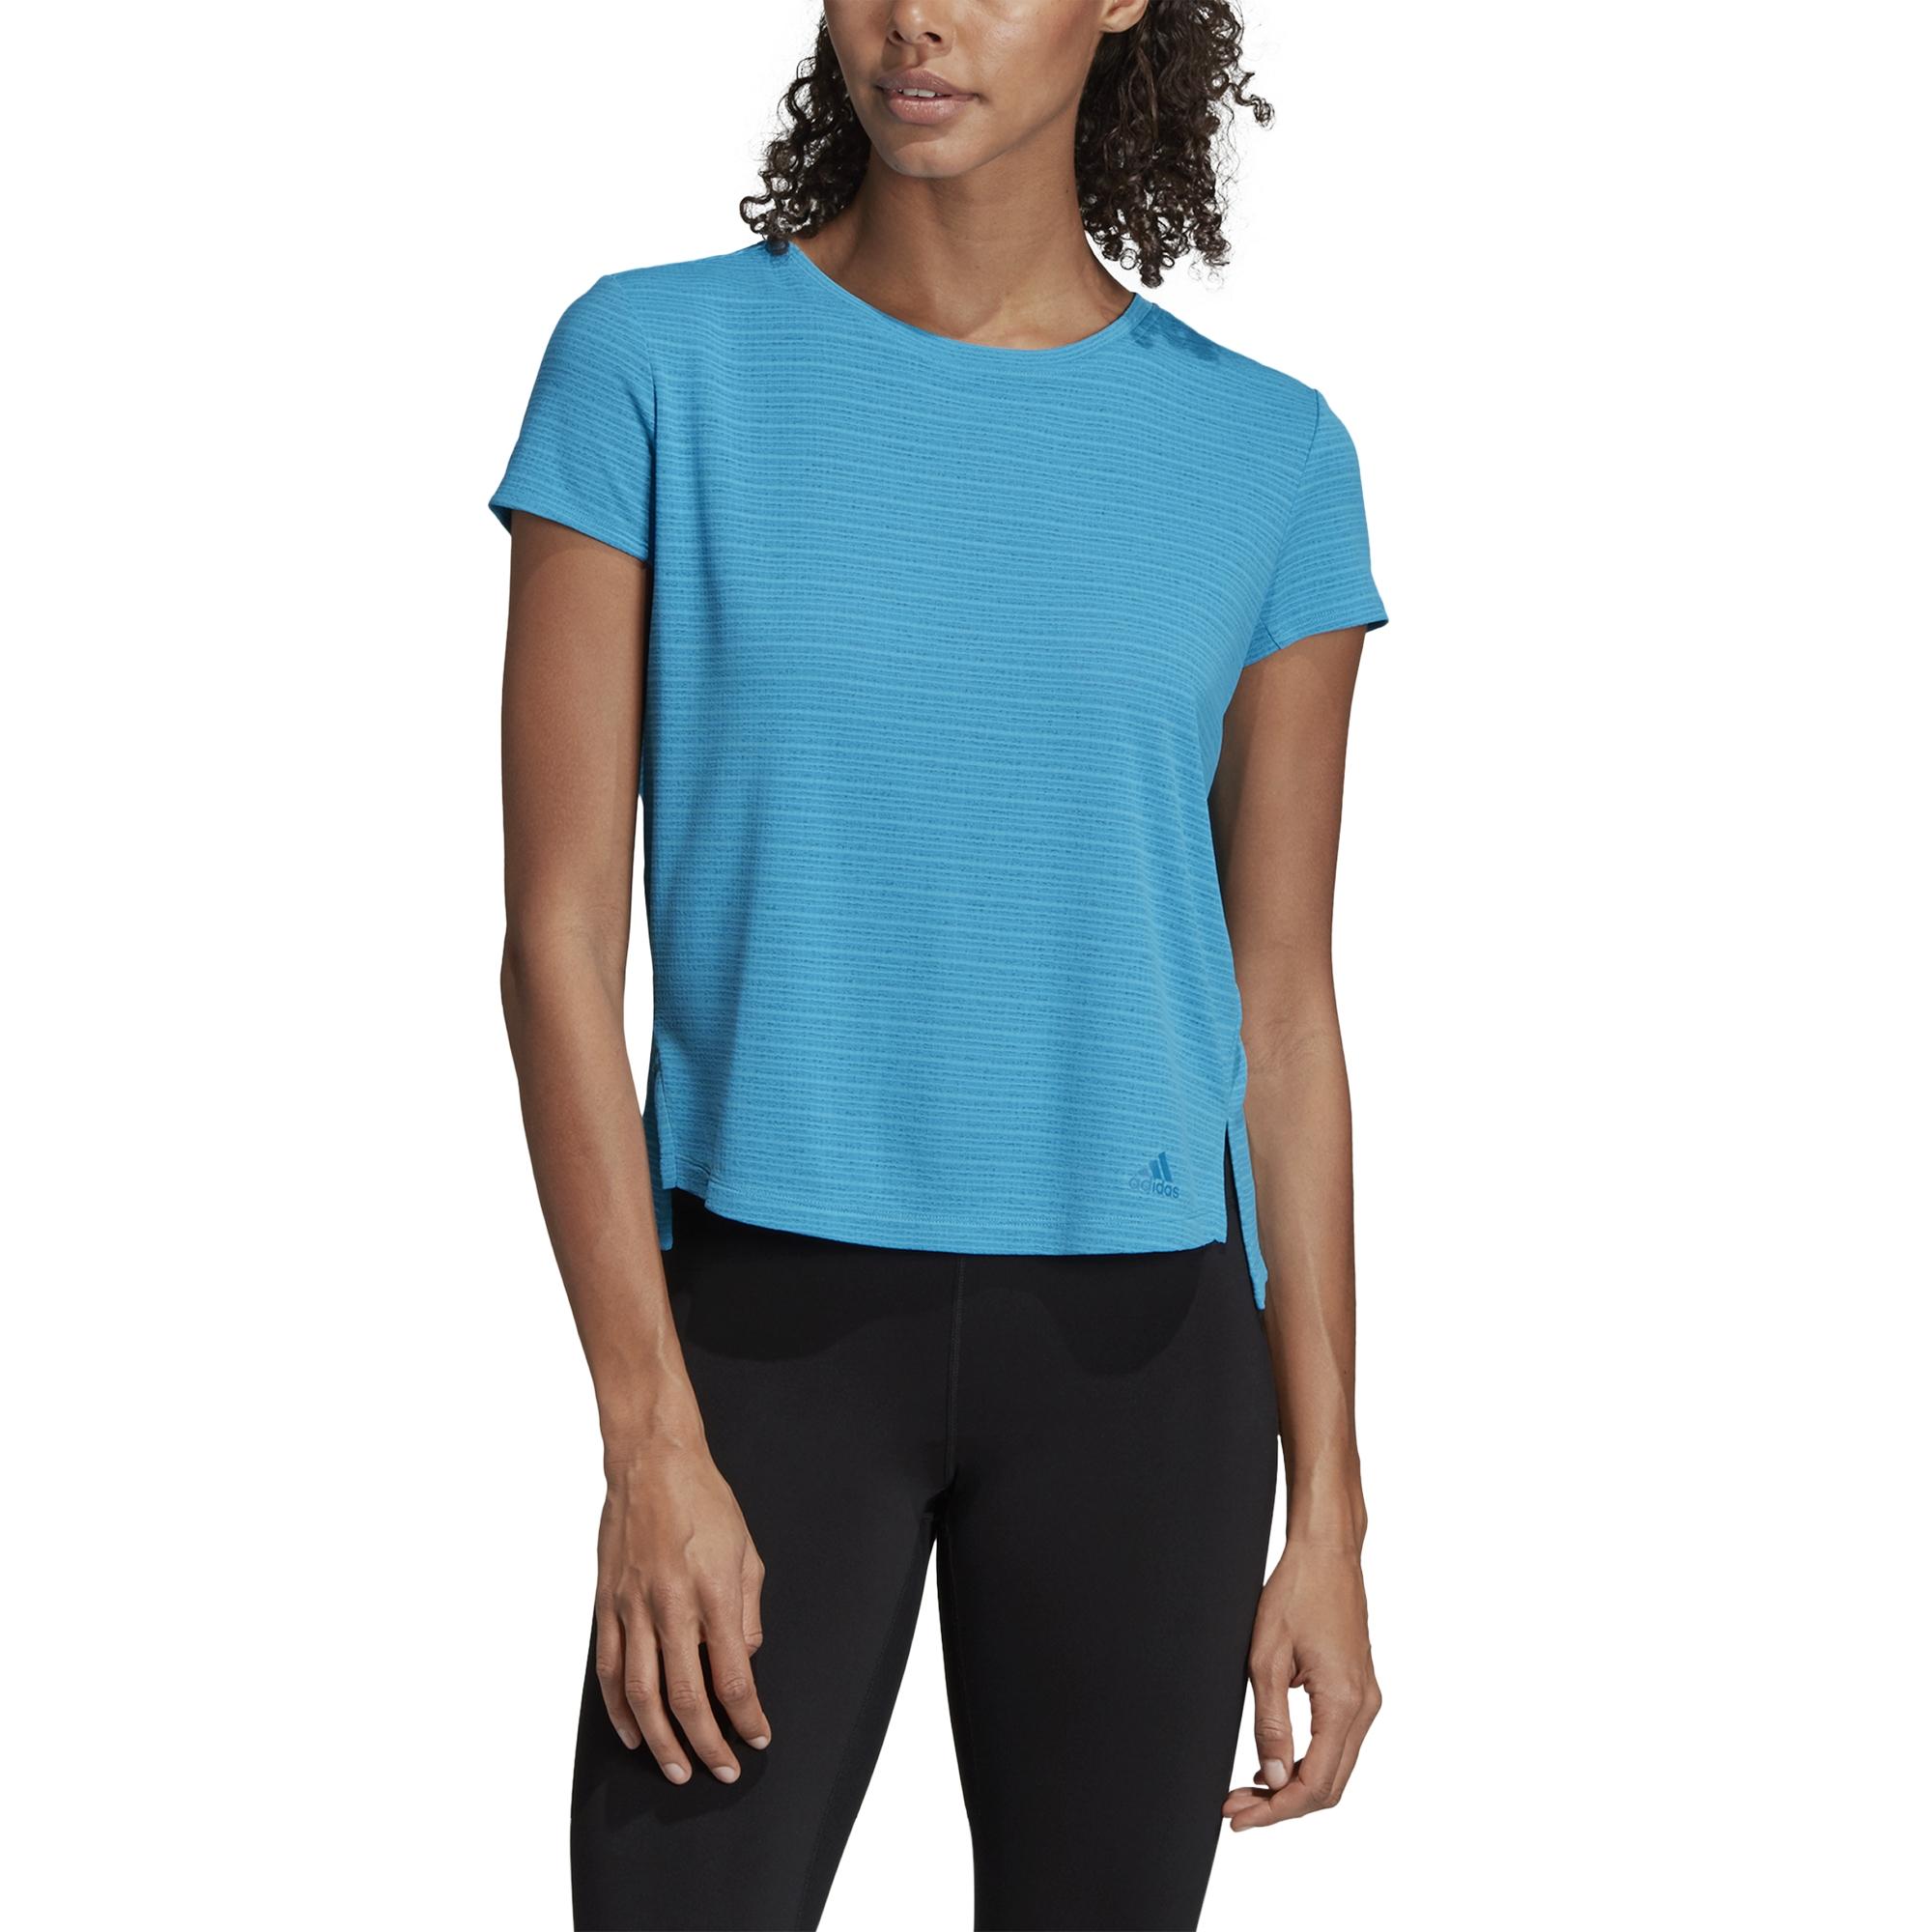 promo code 51f34 6039c Femme Chill T Shirt Adidas Freelift PwnRnzTqA